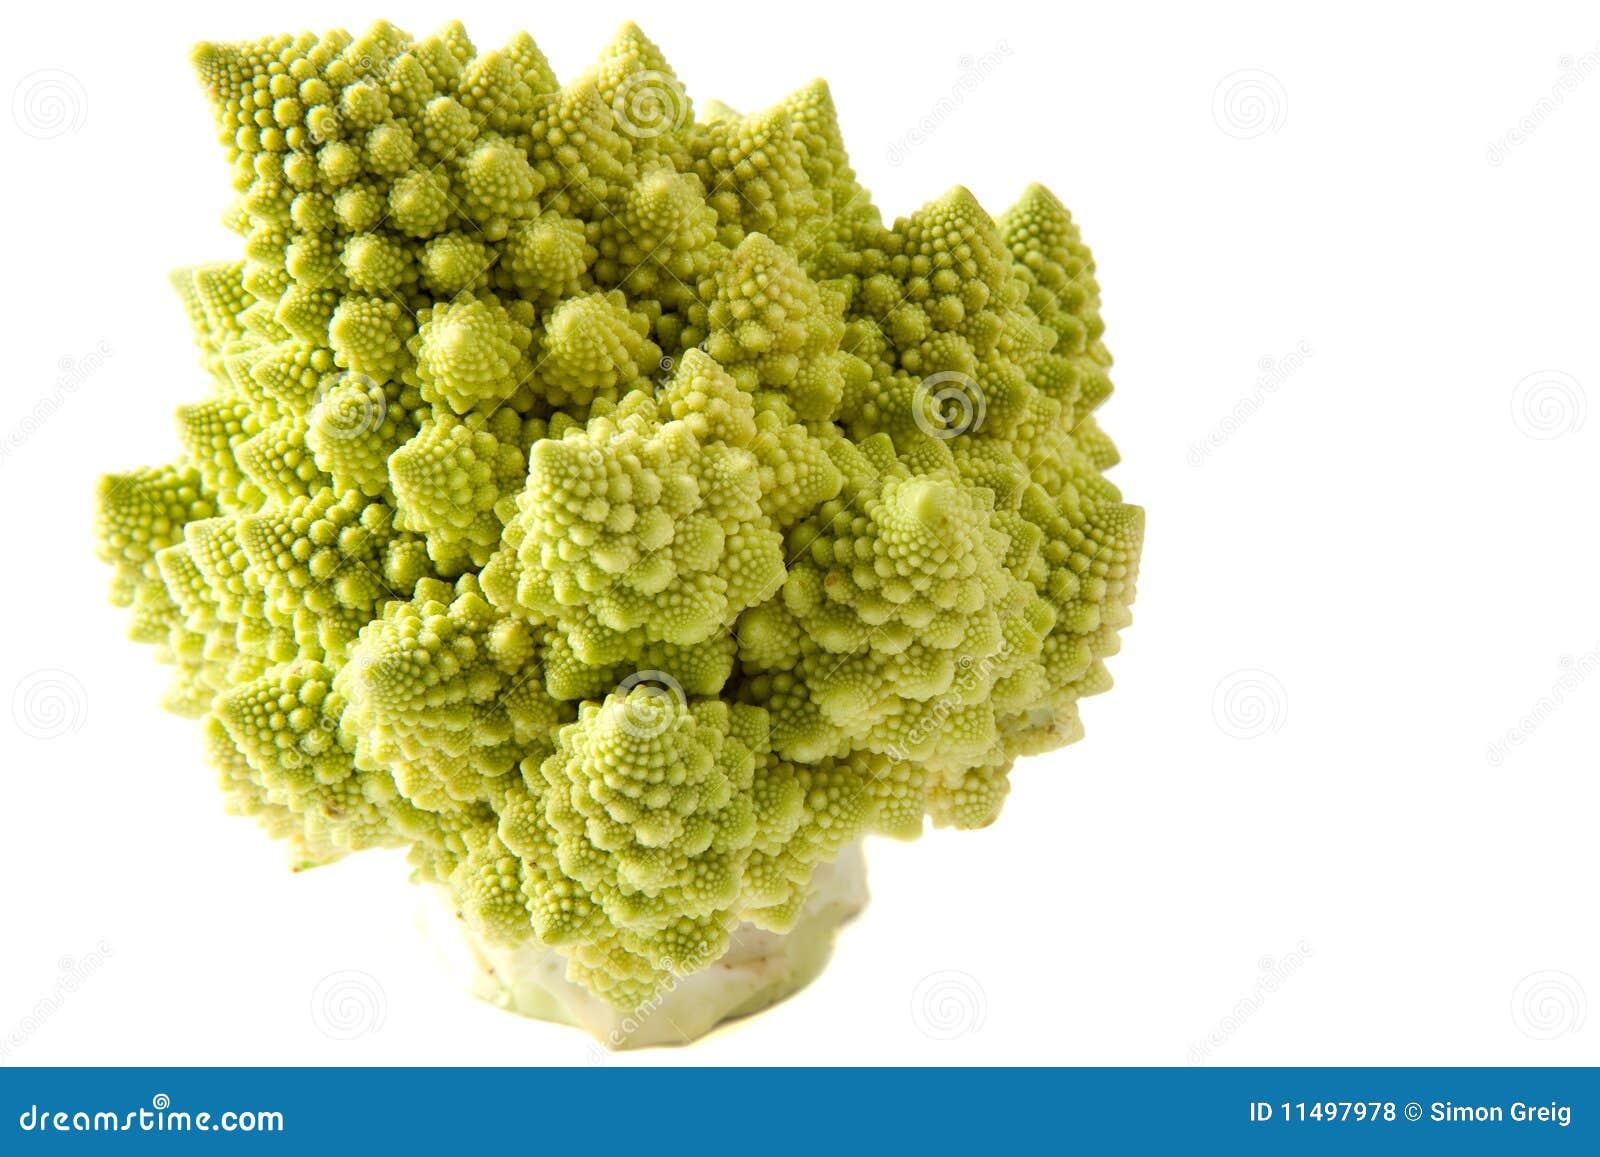 Clé élevée de broccoli de Romanesco